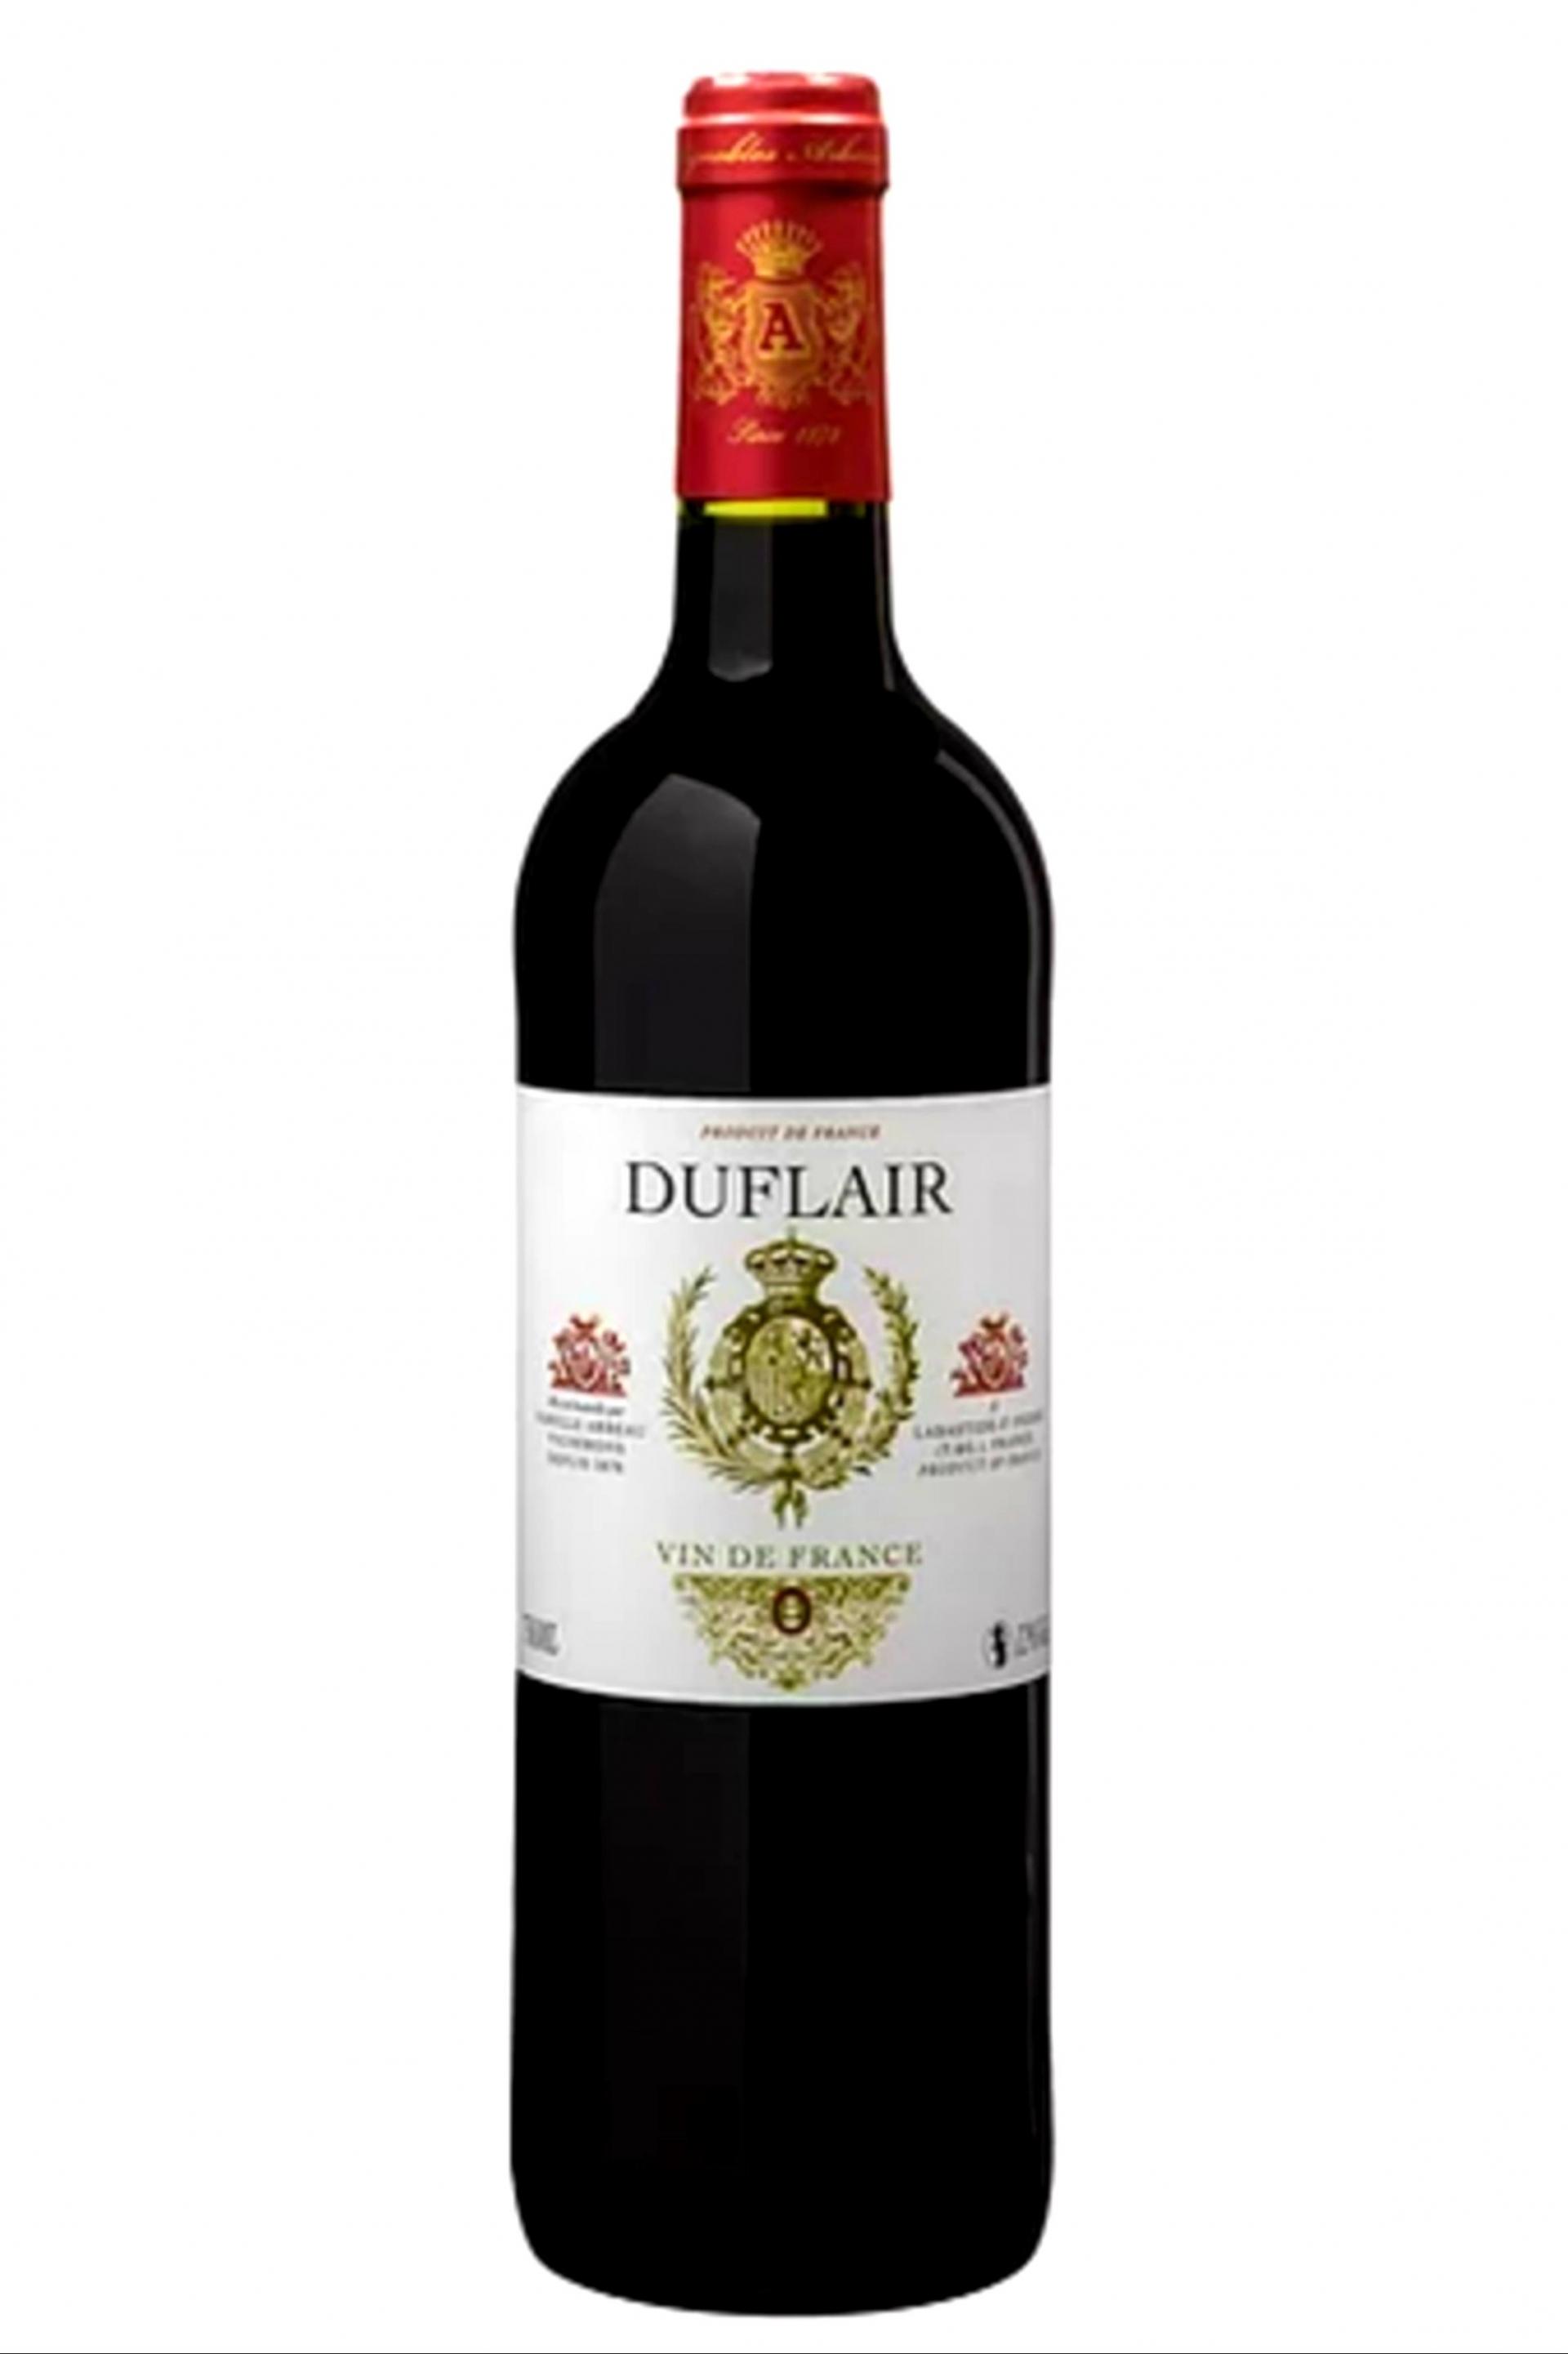 Duflair Vin de France 750ml